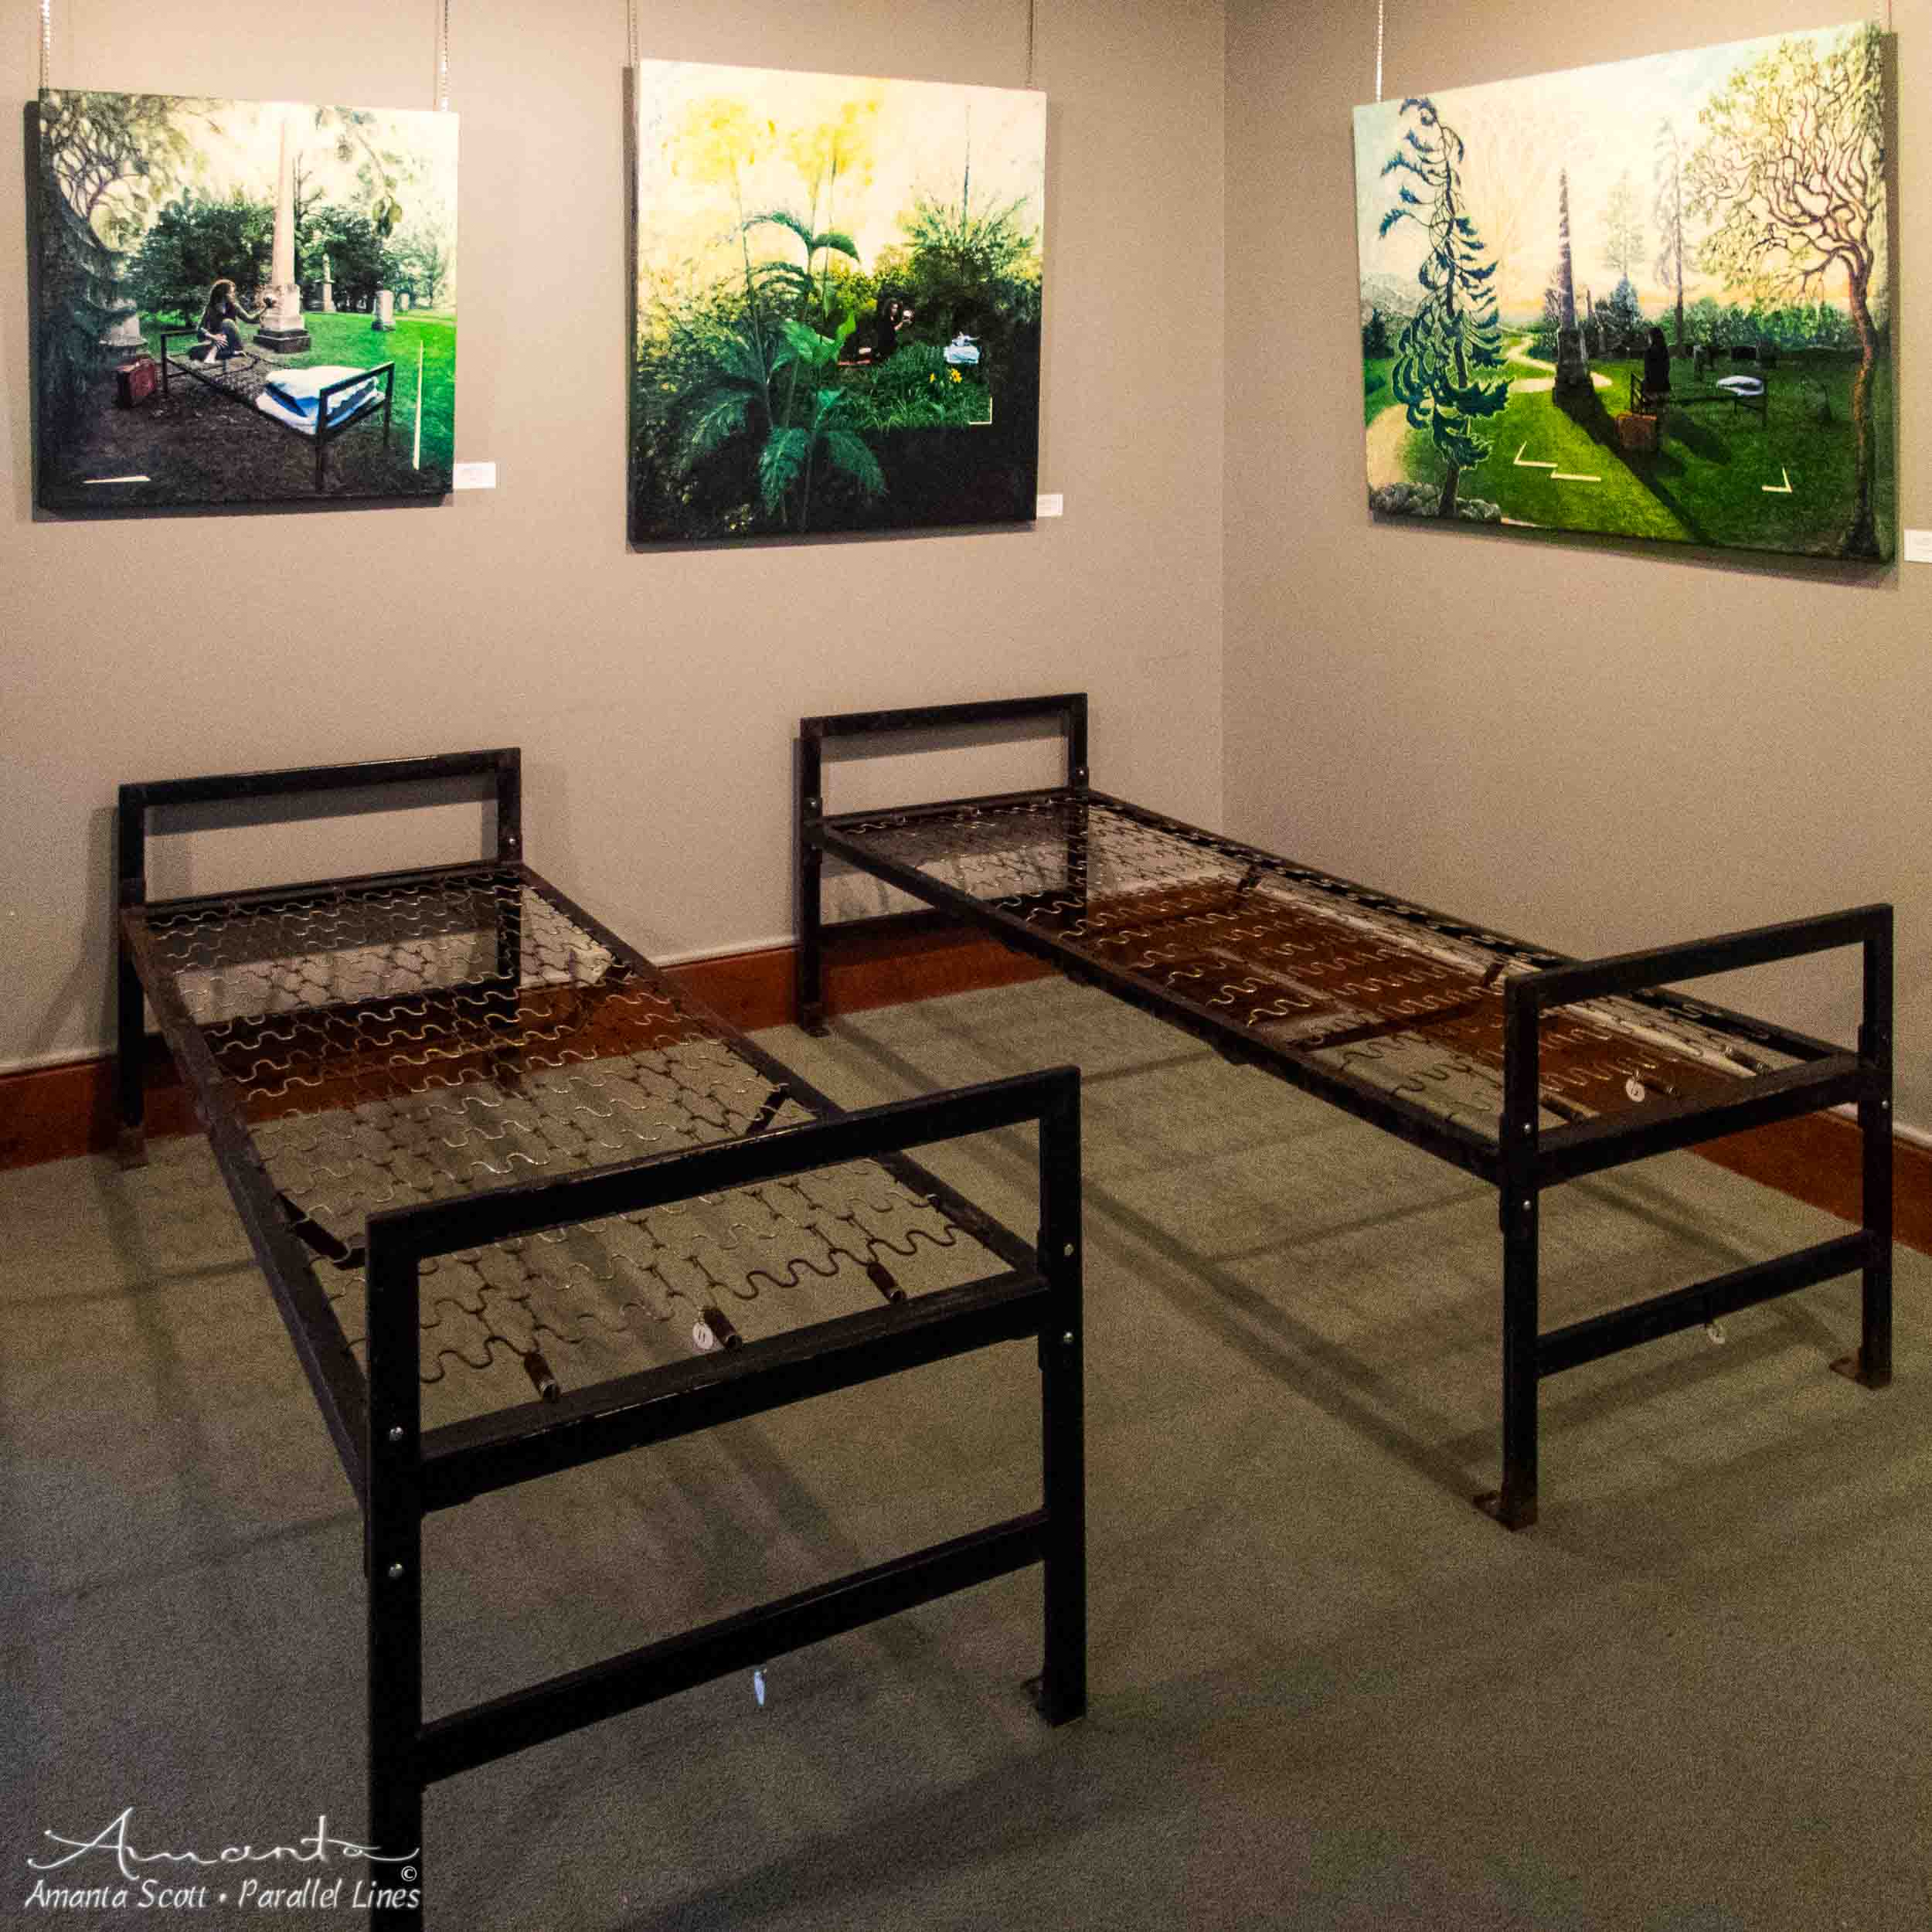 Exhibition-3030183.jpg